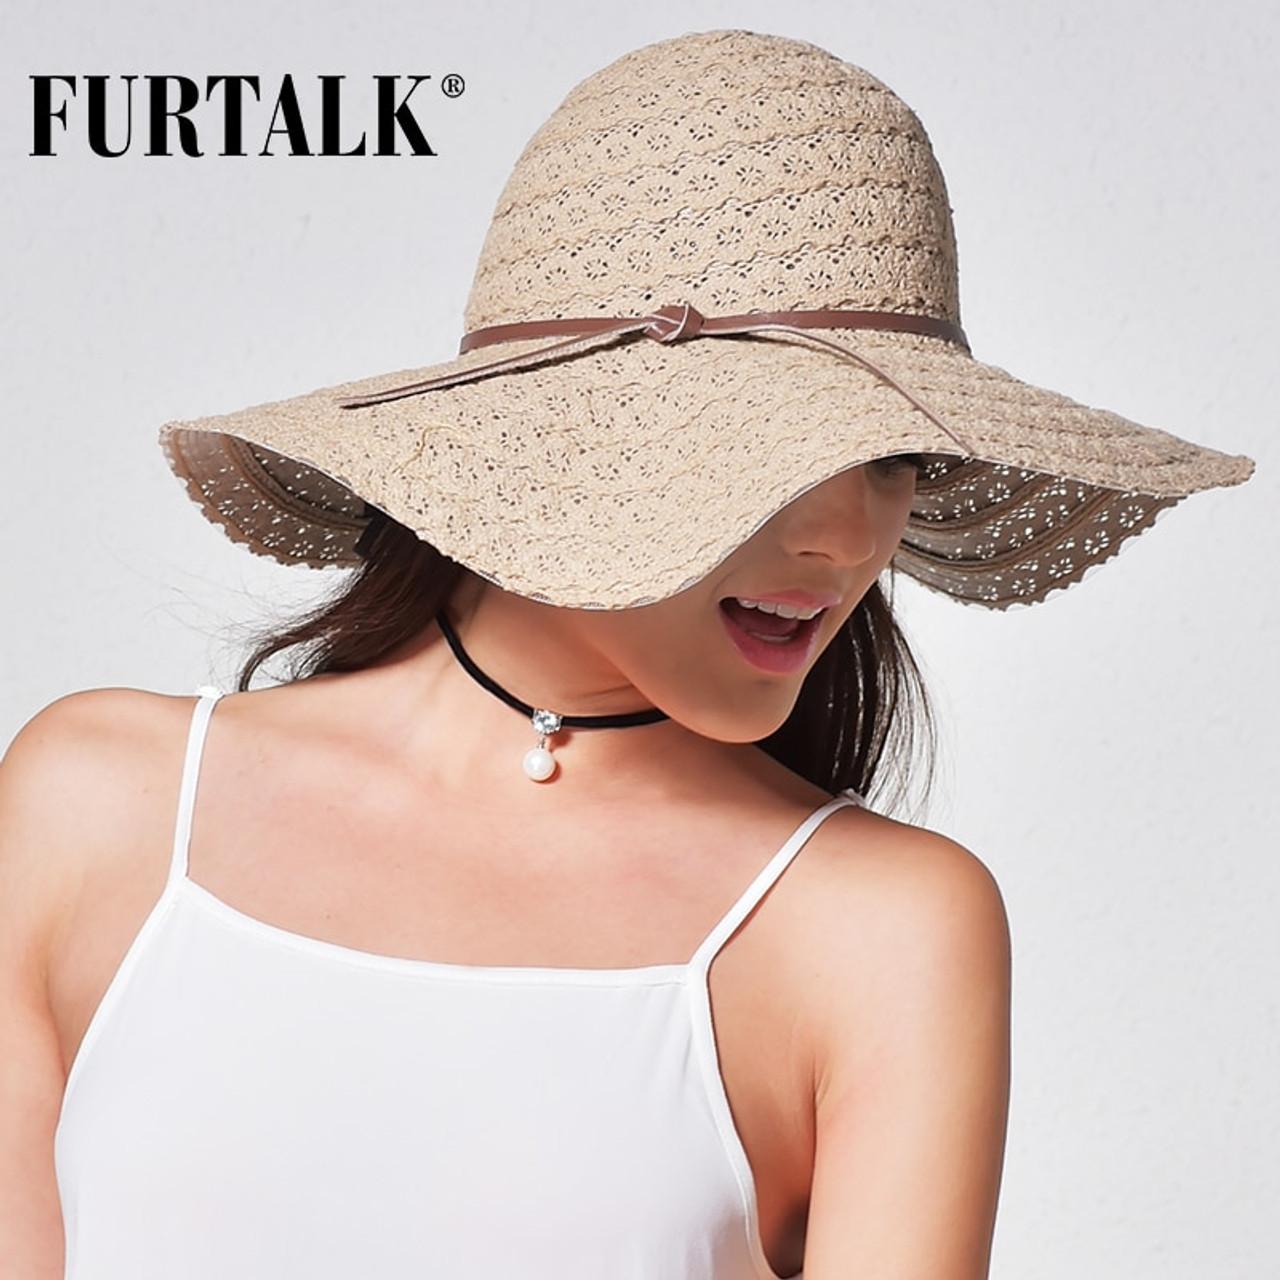 7a05f40c5239 ... FURTALK Summer Hats for Women Fashion Design Women Beach Sun Hat  Foldable Brimmed Straw Hat ...